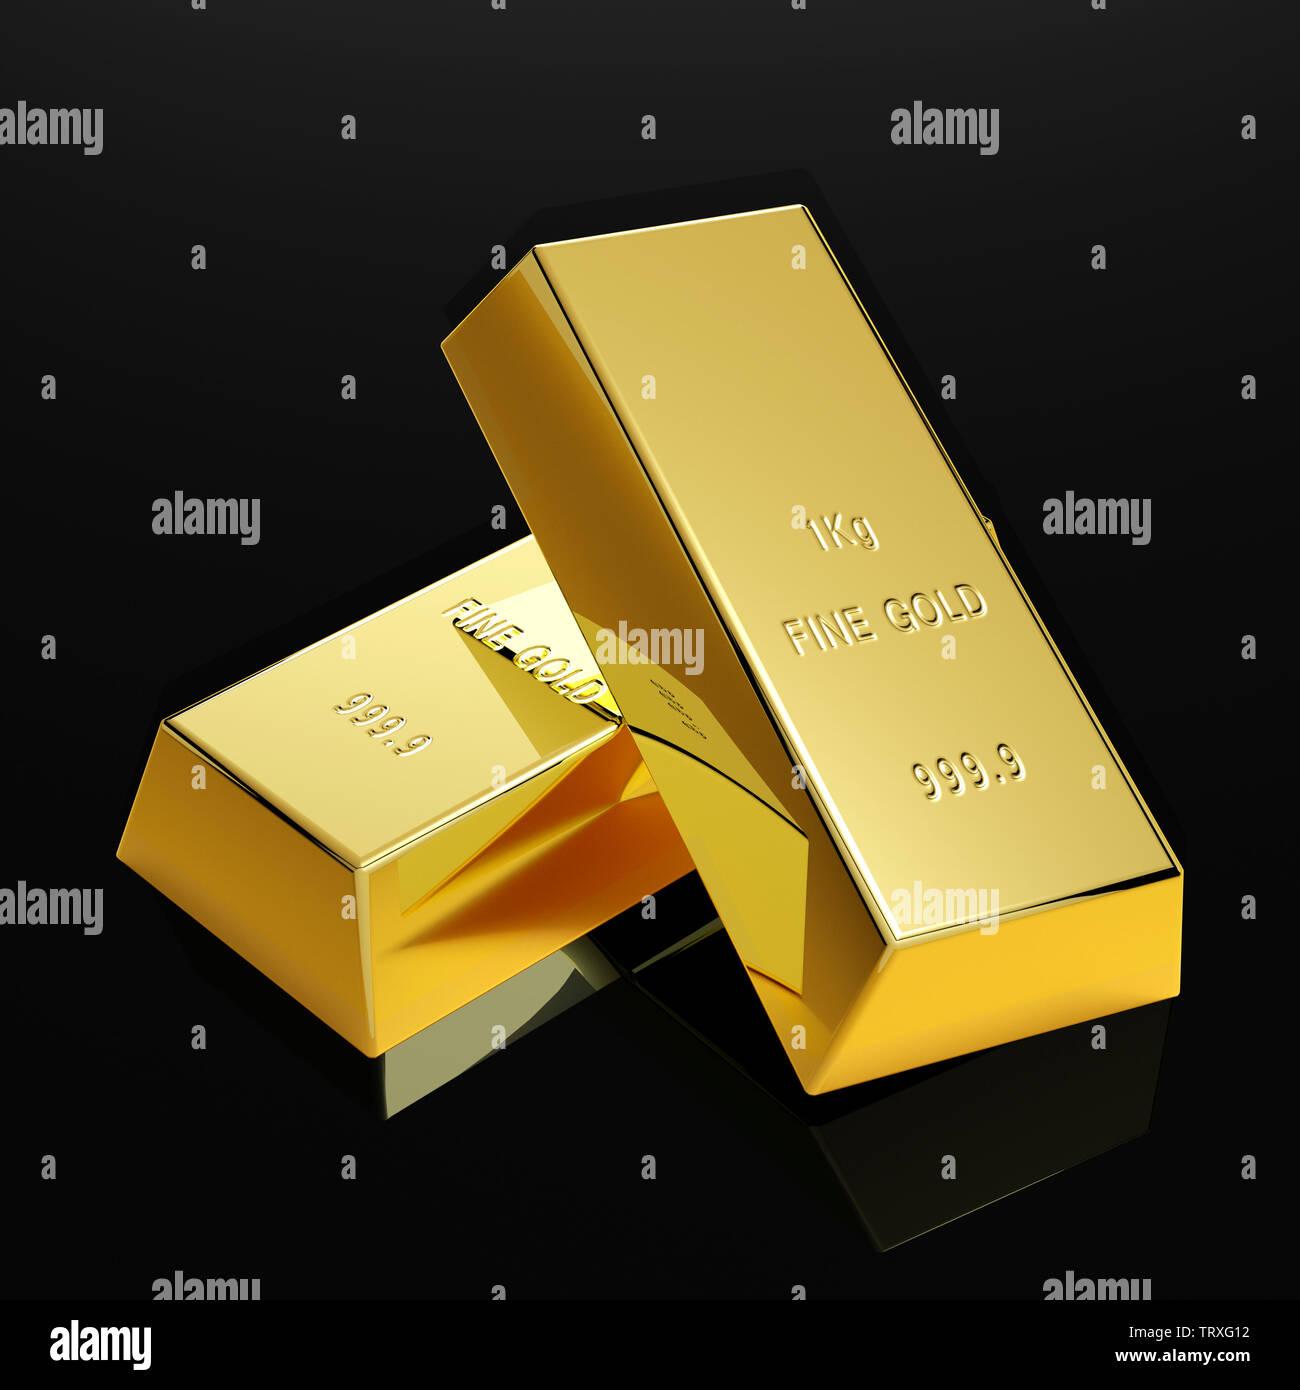 polished gold bars on table - Illustration - Stock Image